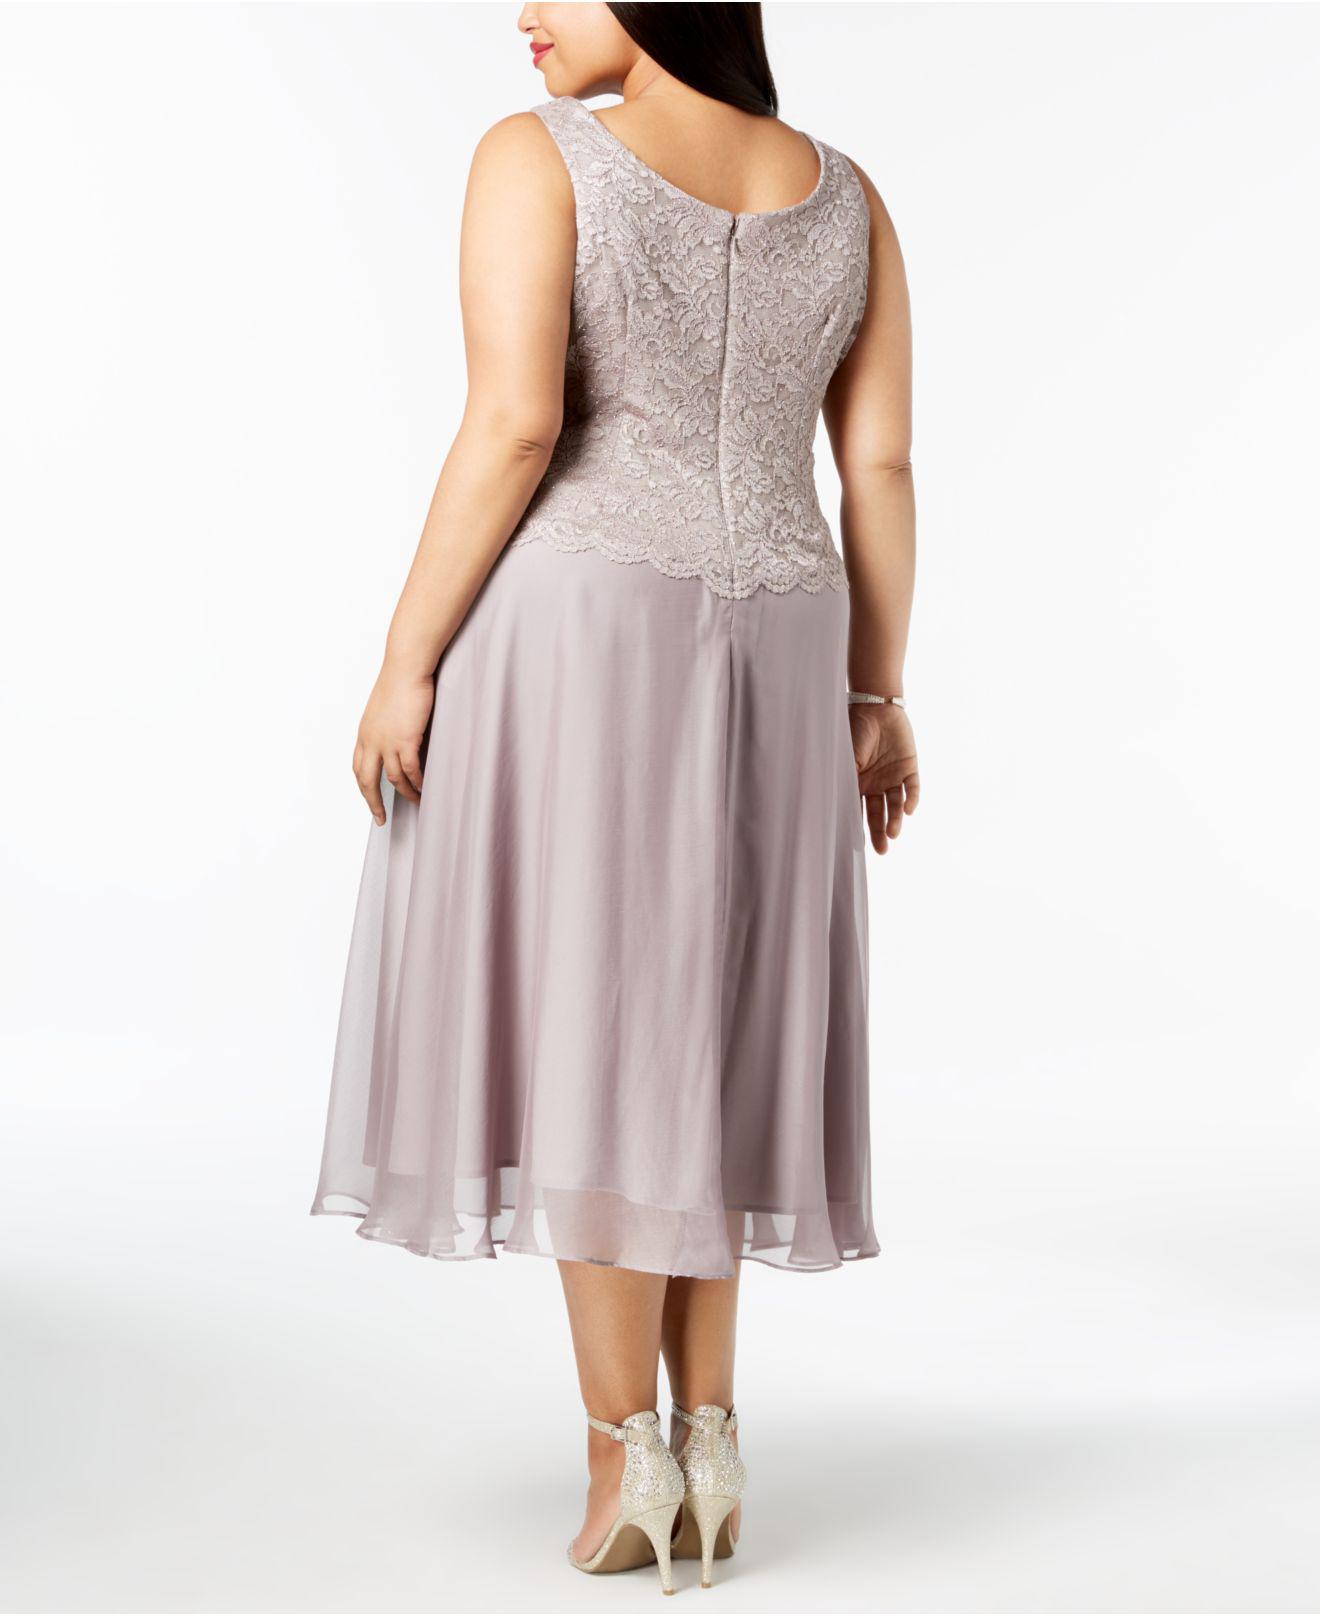 986ef27cf2057 Lyst - Alex Evenings Plus Size Glitter Lace Midi Dress   Jacket